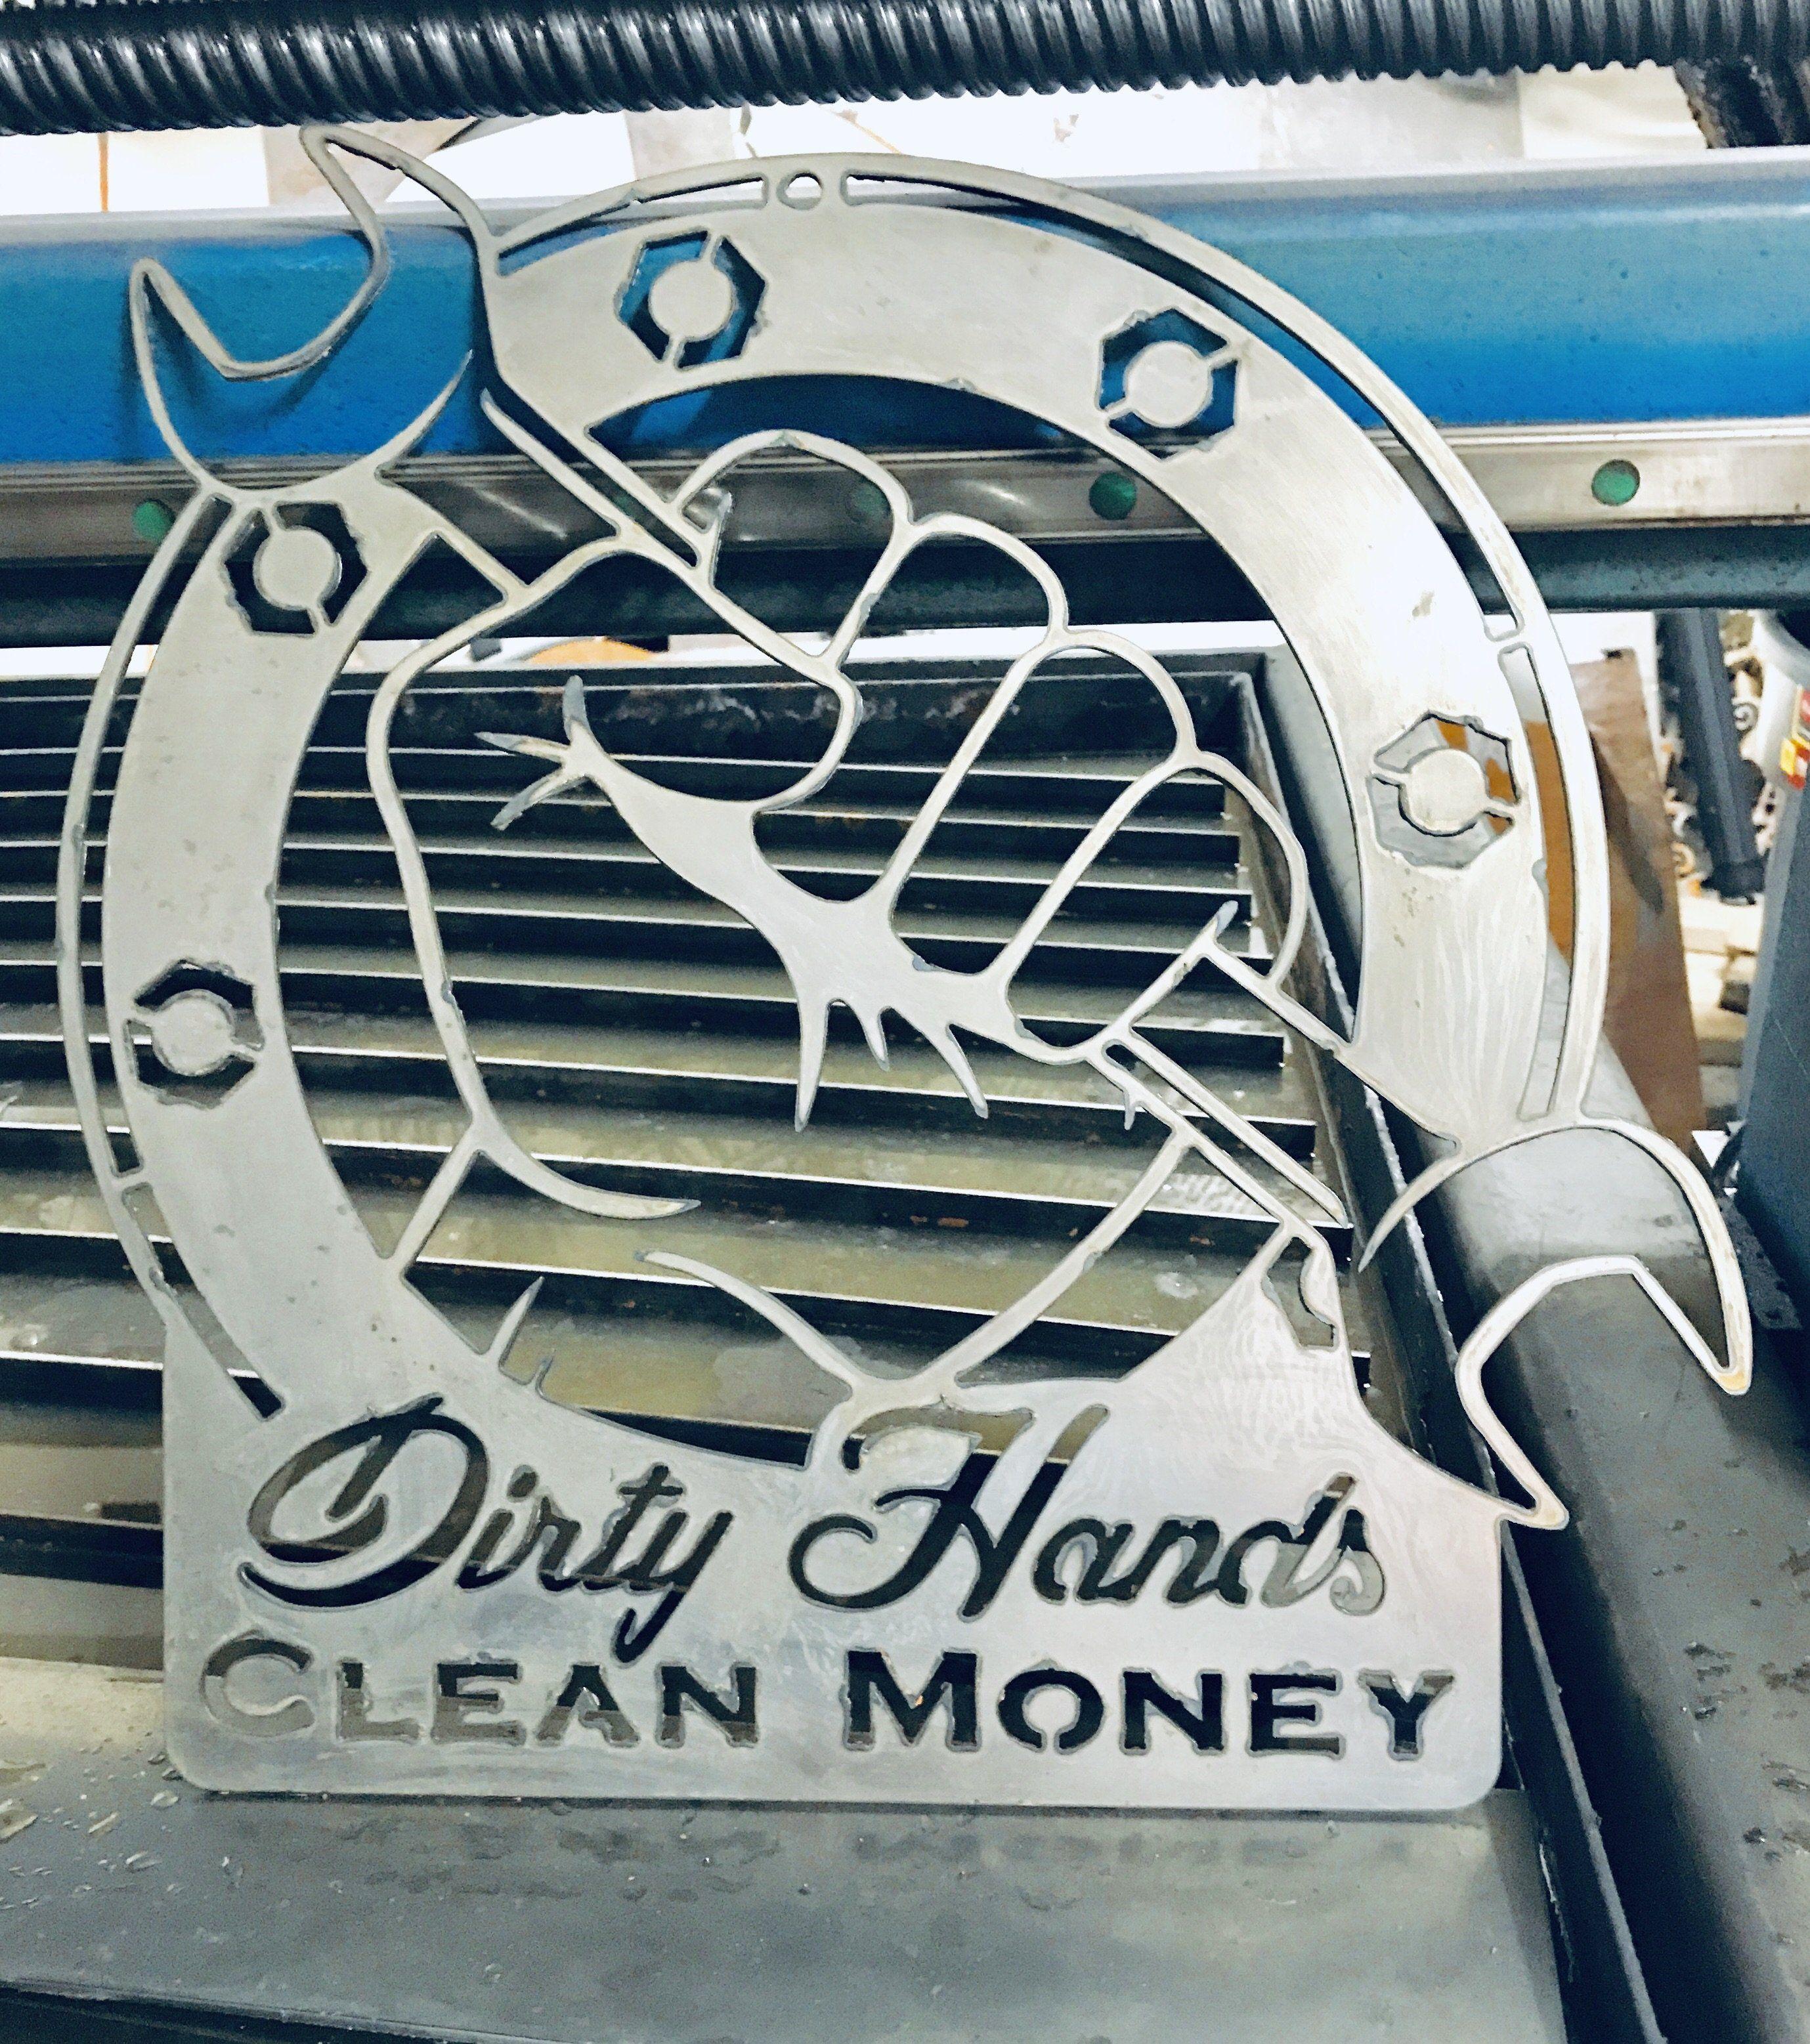 Dirty Hands Clean Money Vinyl Sticker Decal Diesel Mechanic Aircraft Motorcycle